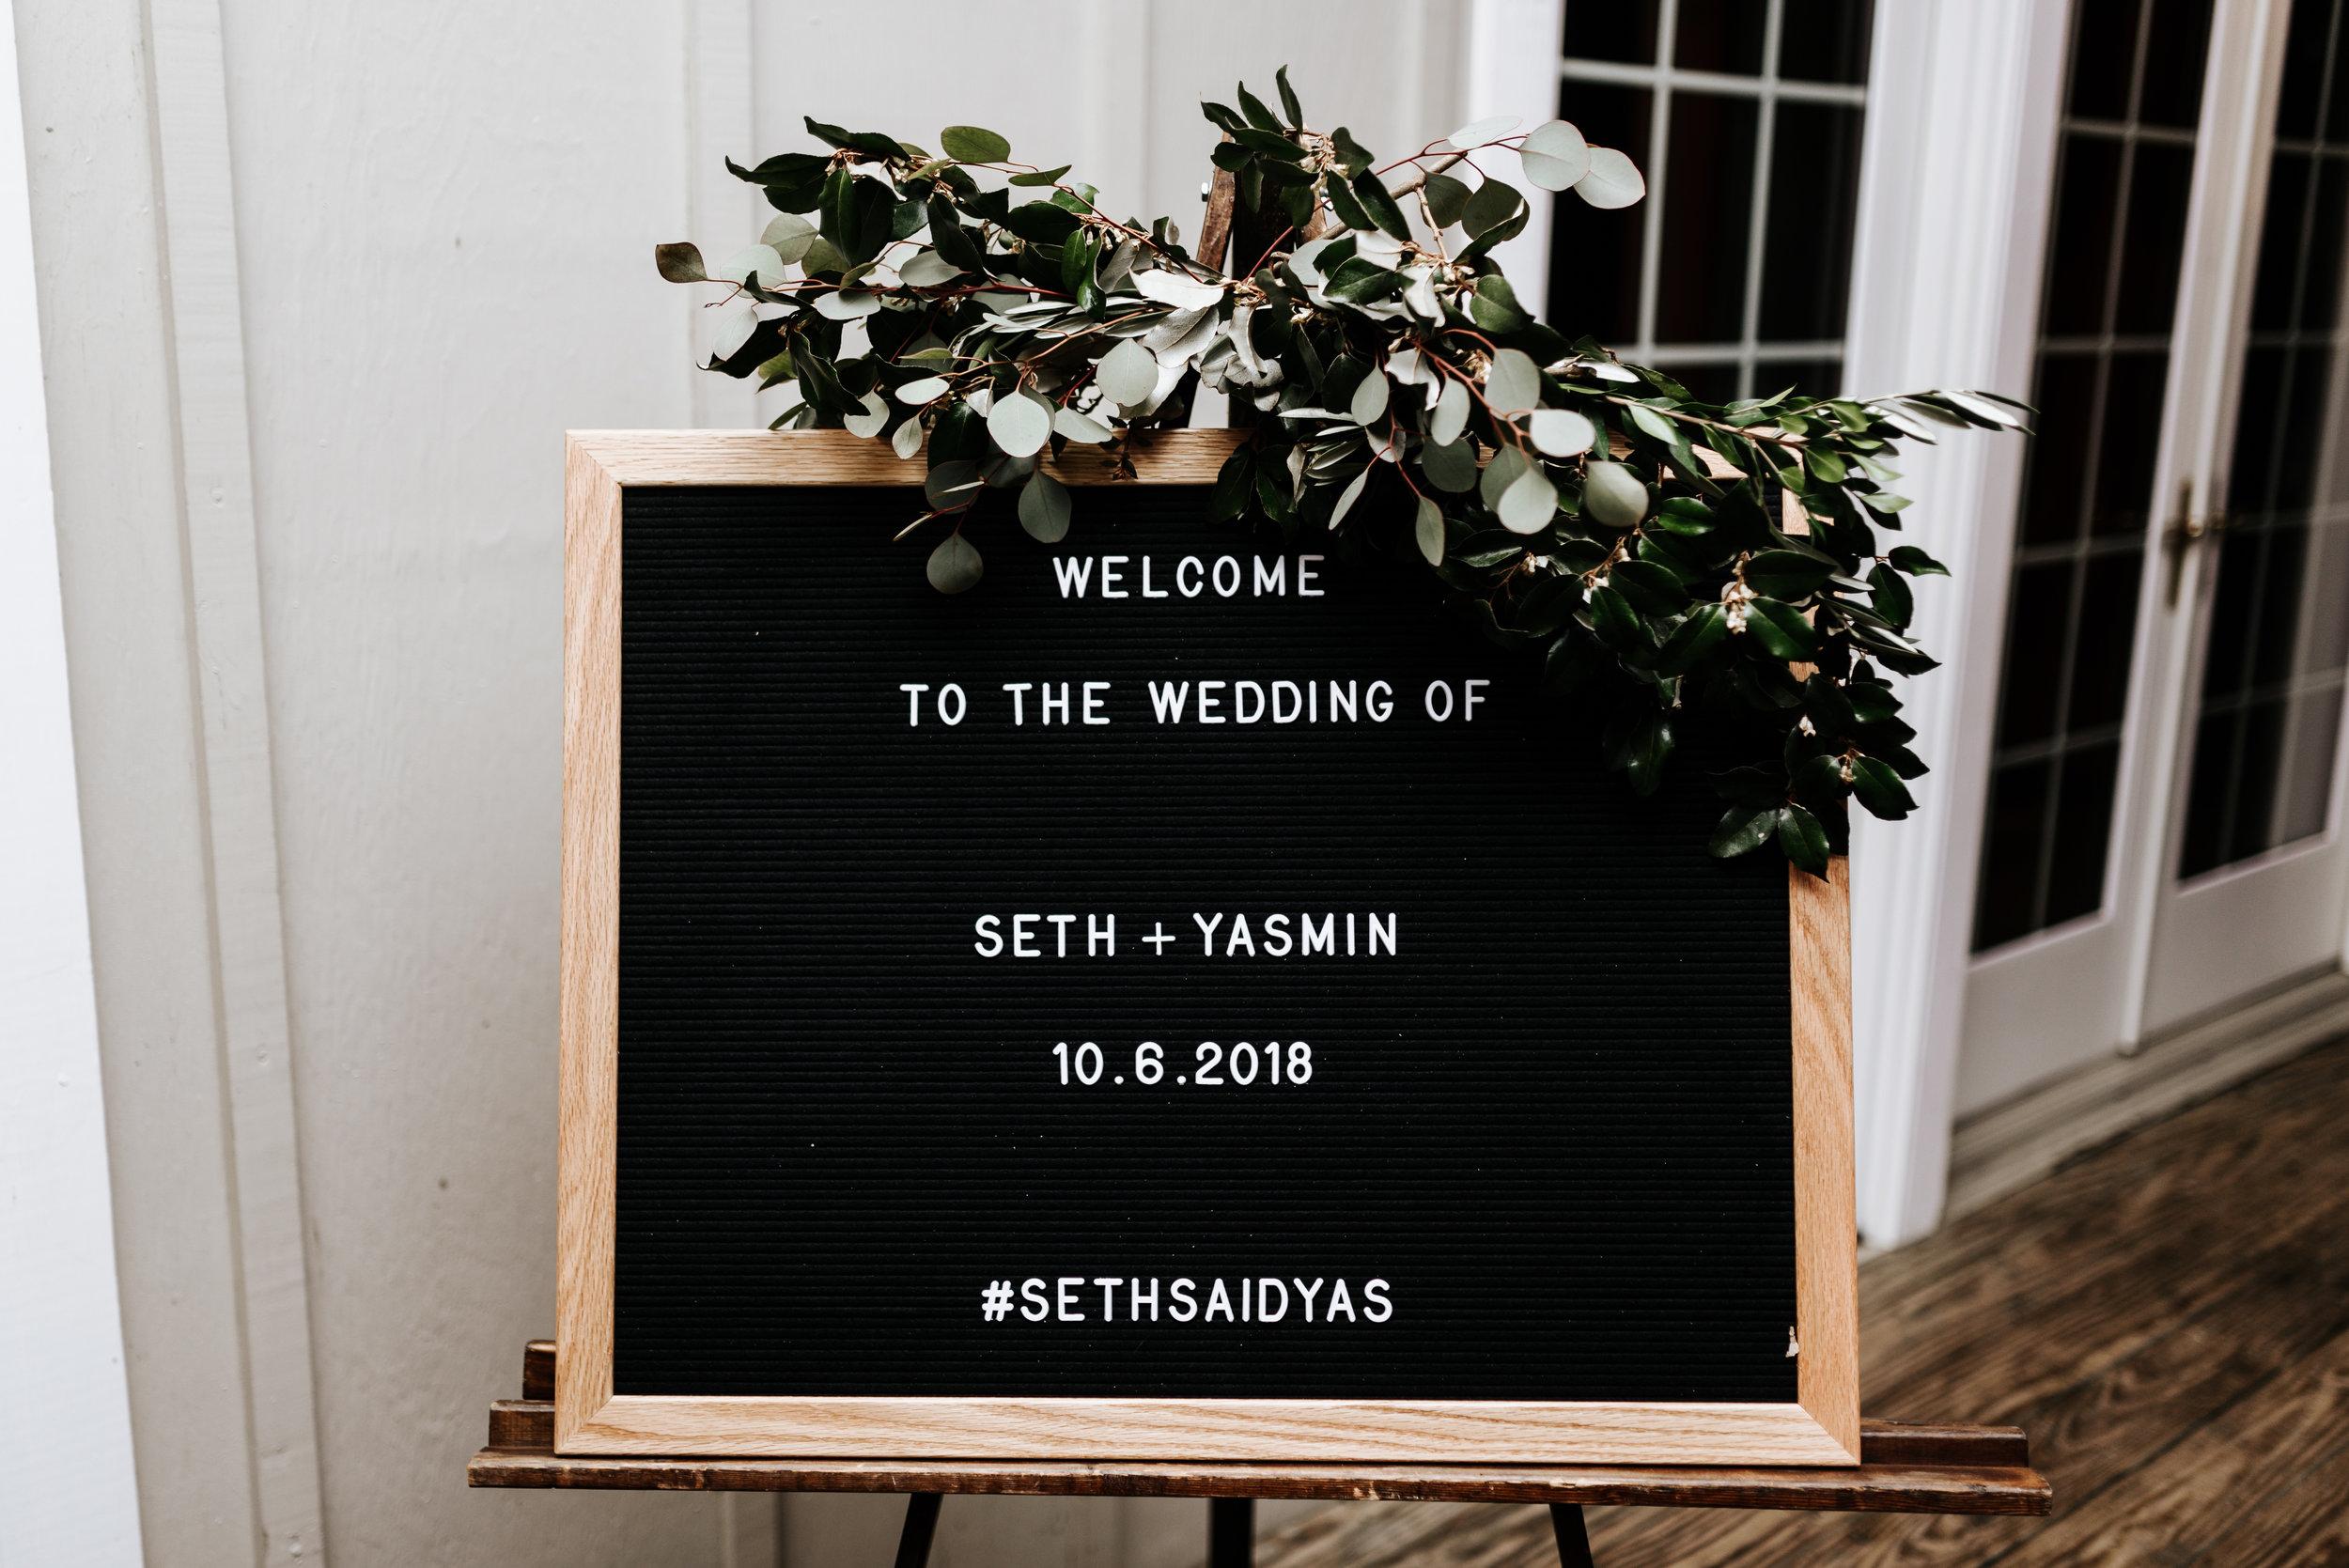 Veritas-Vineyards-and-Winery-Wedding-Photography-Afton-Virginia-Yasmin-Seth-Photography-by-V-9822.jpg